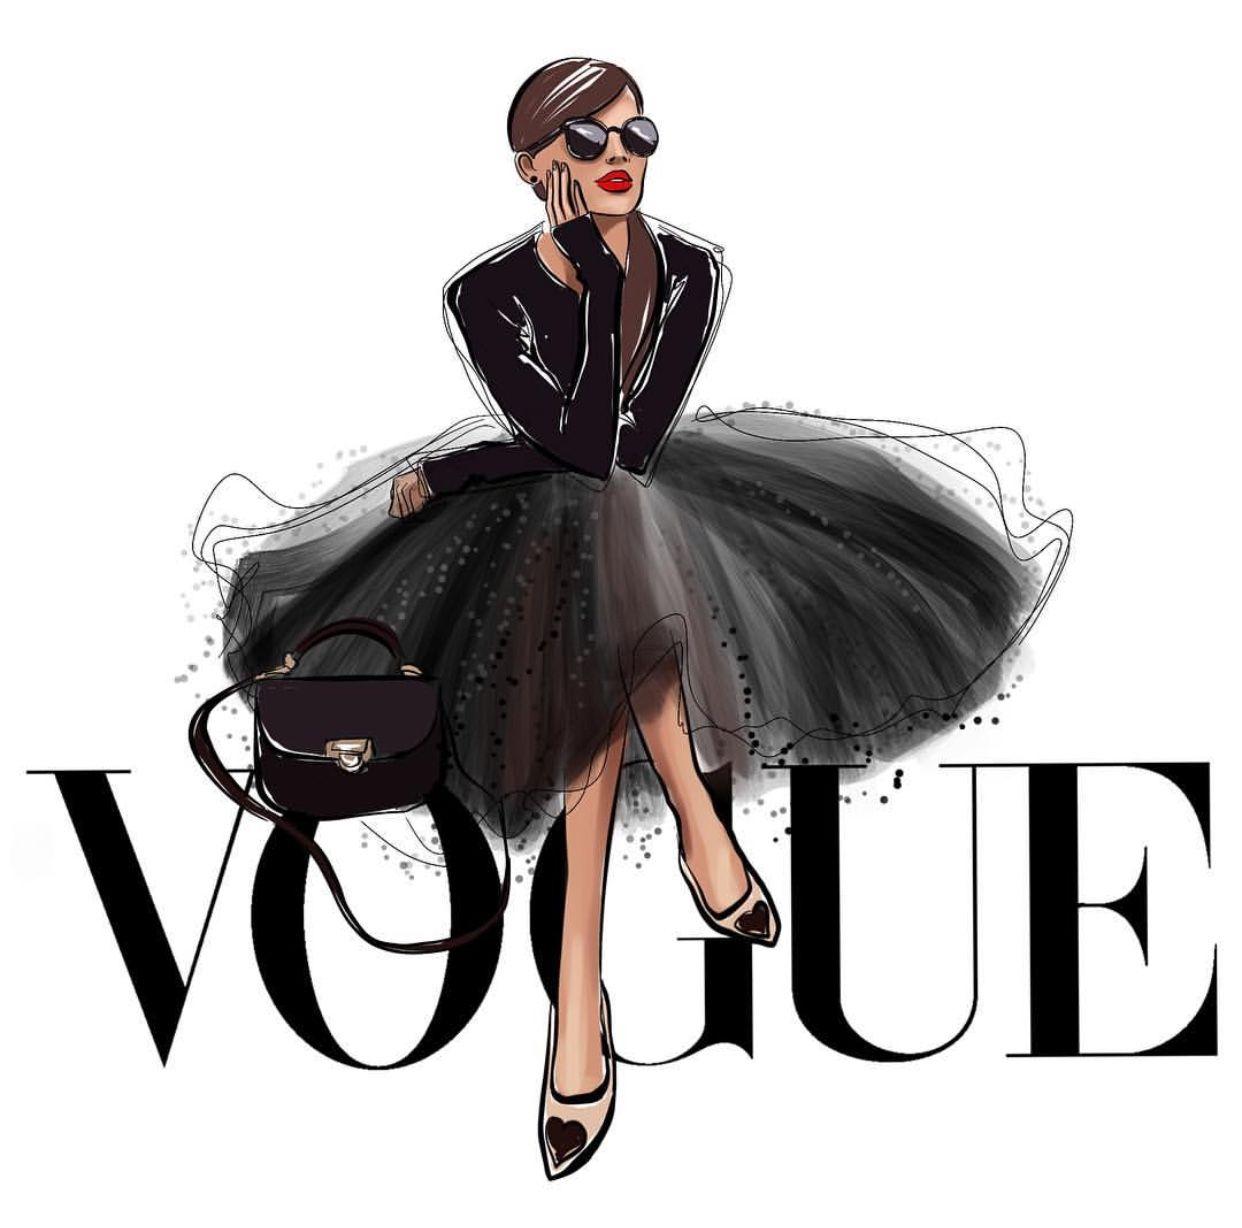 nk_fashionillustration FashionIllustrations Be